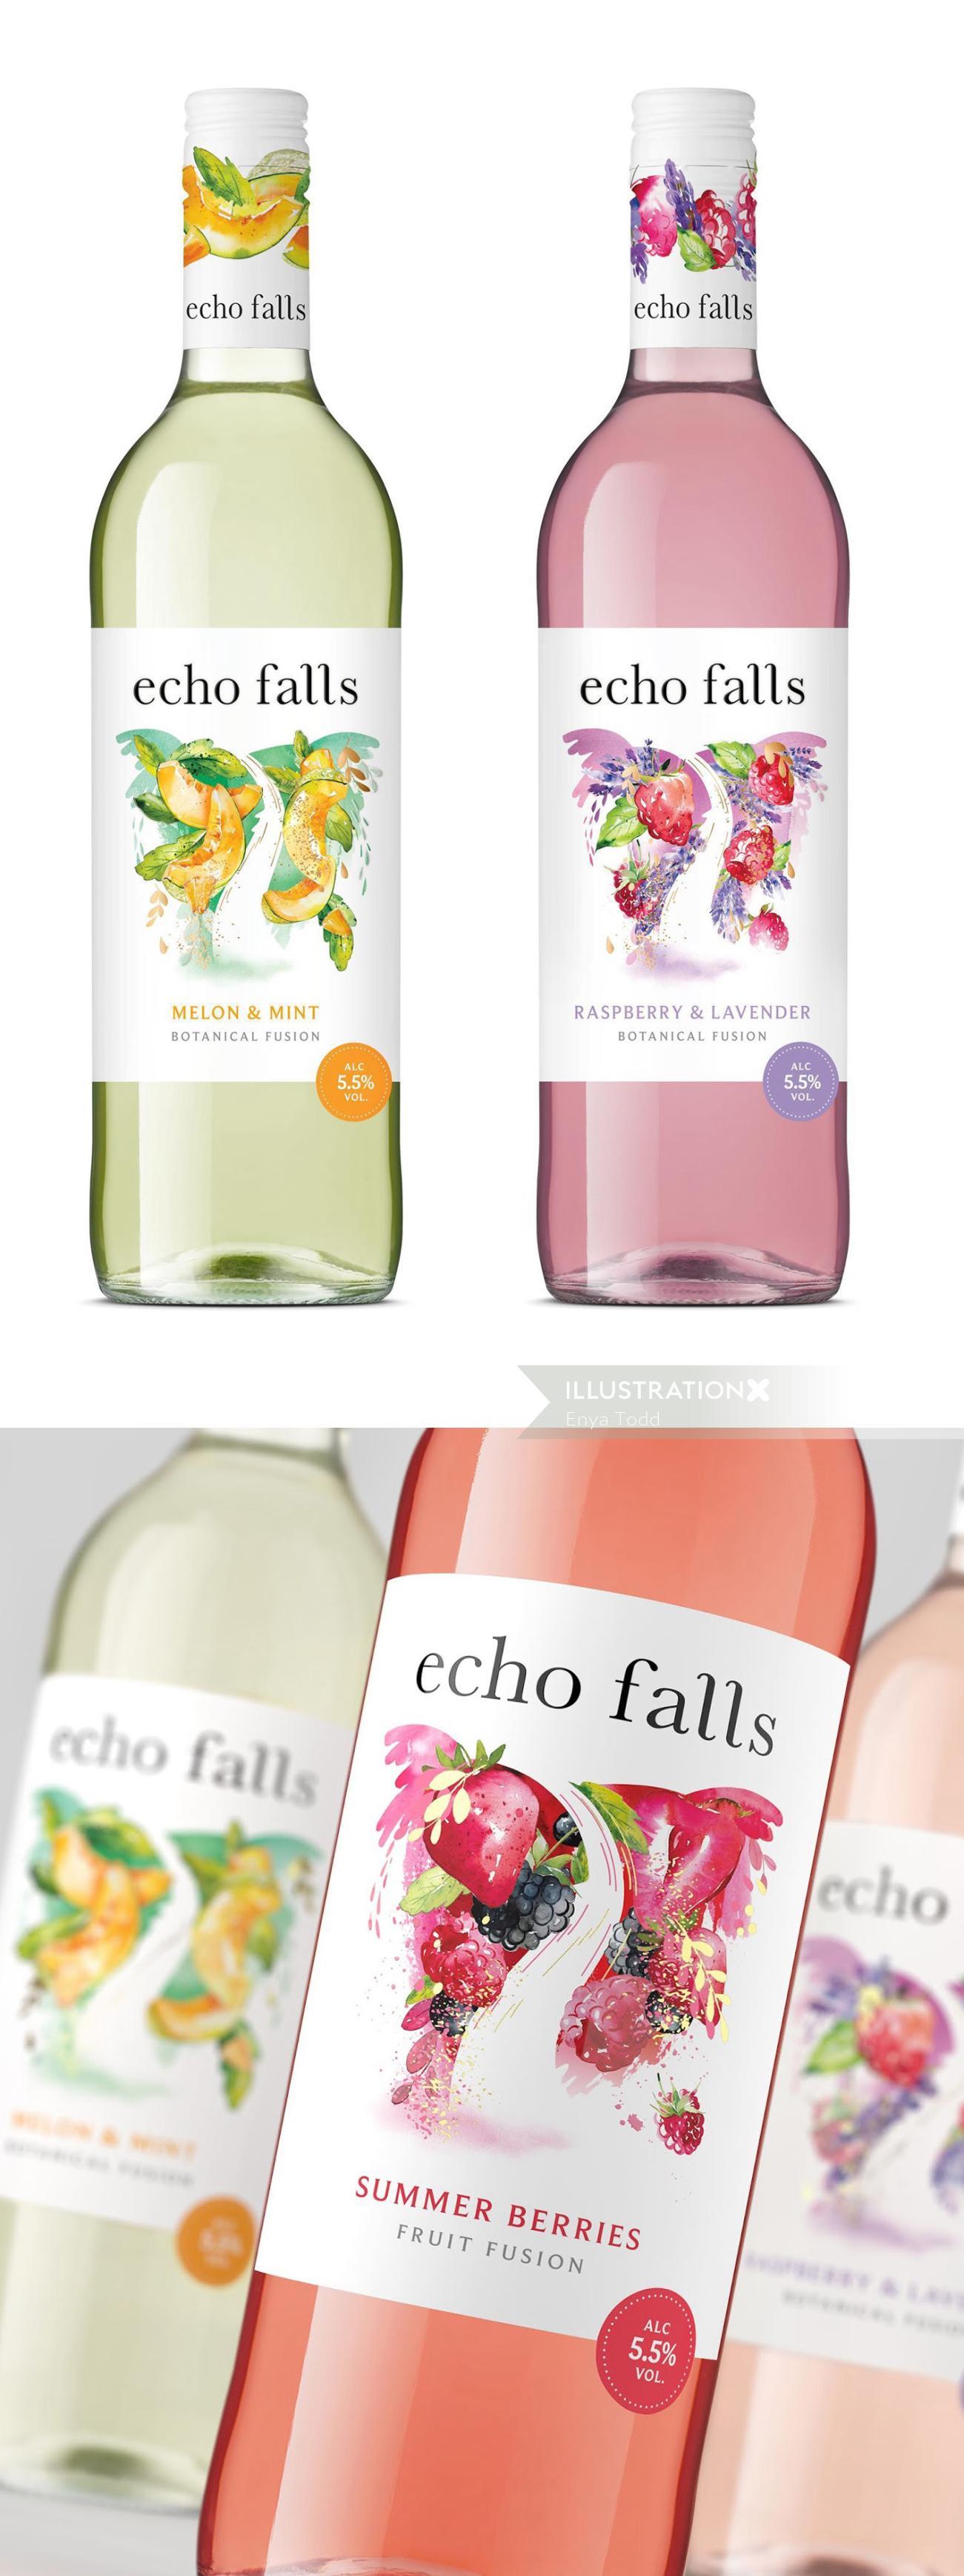 Food & Drink Echo Falls wine